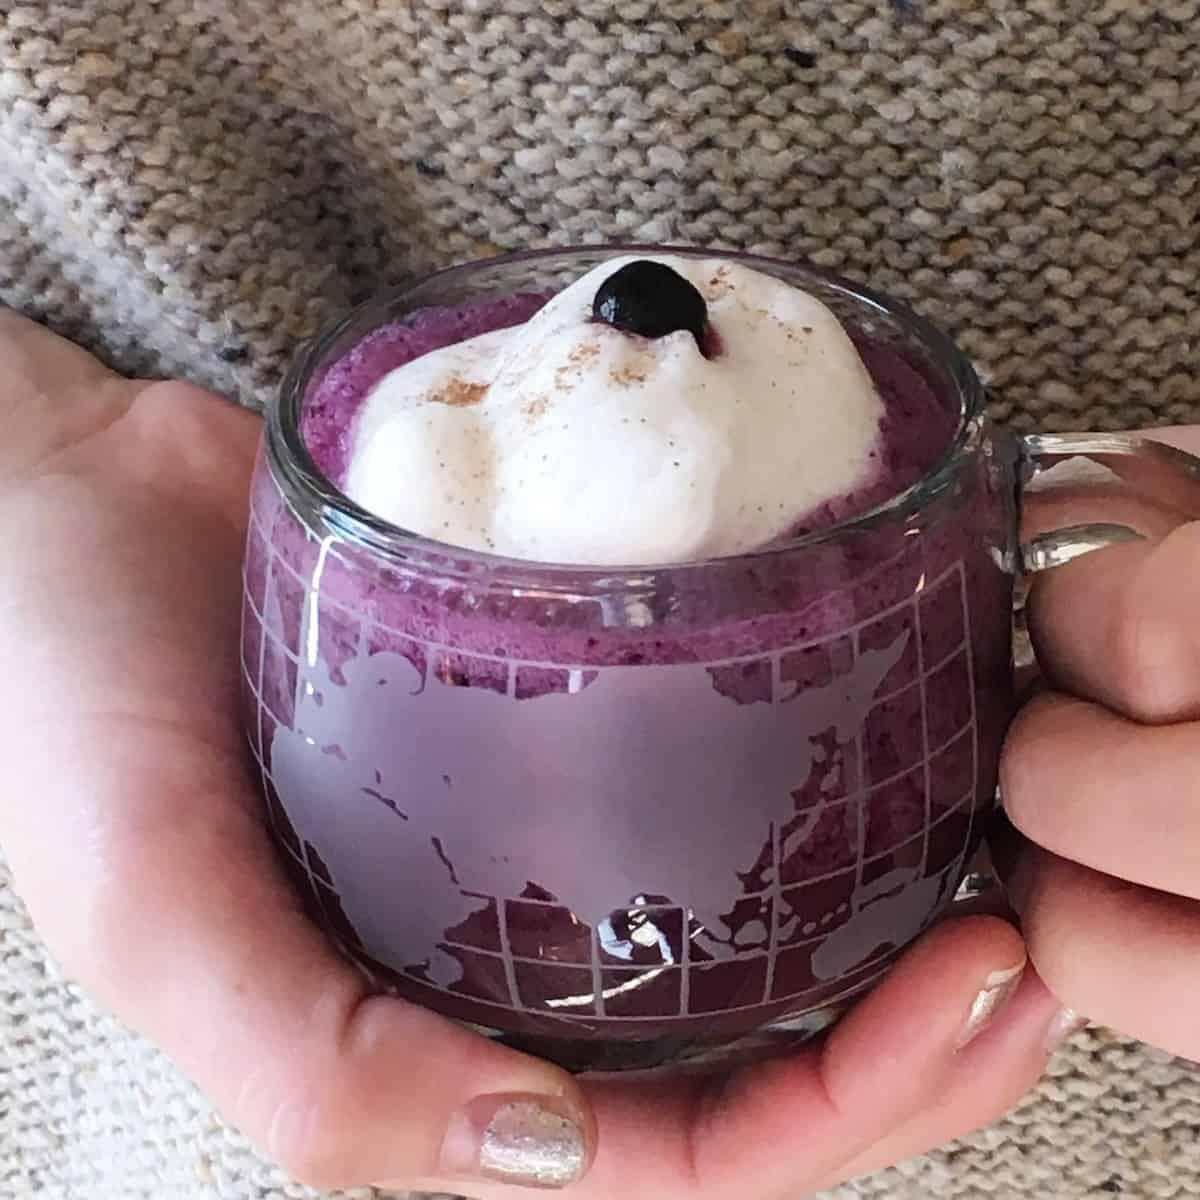 hands holding blueberry latte